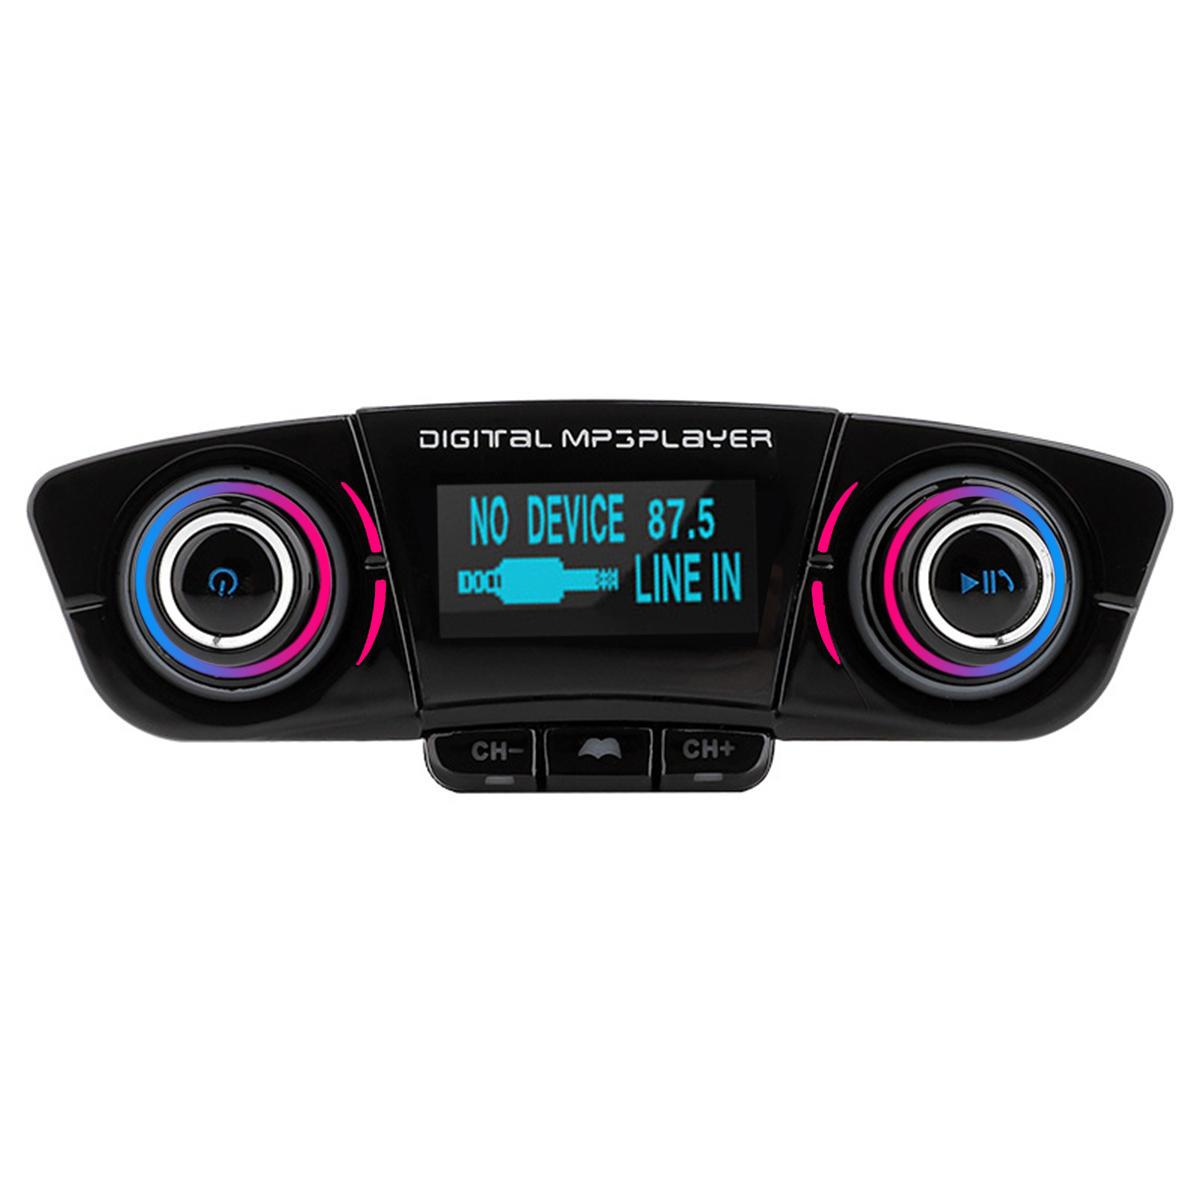 Wireless bluetooth Handsfree Voice Navigation Car Kit FM Transmitter MP3 Player USB Charger AUX